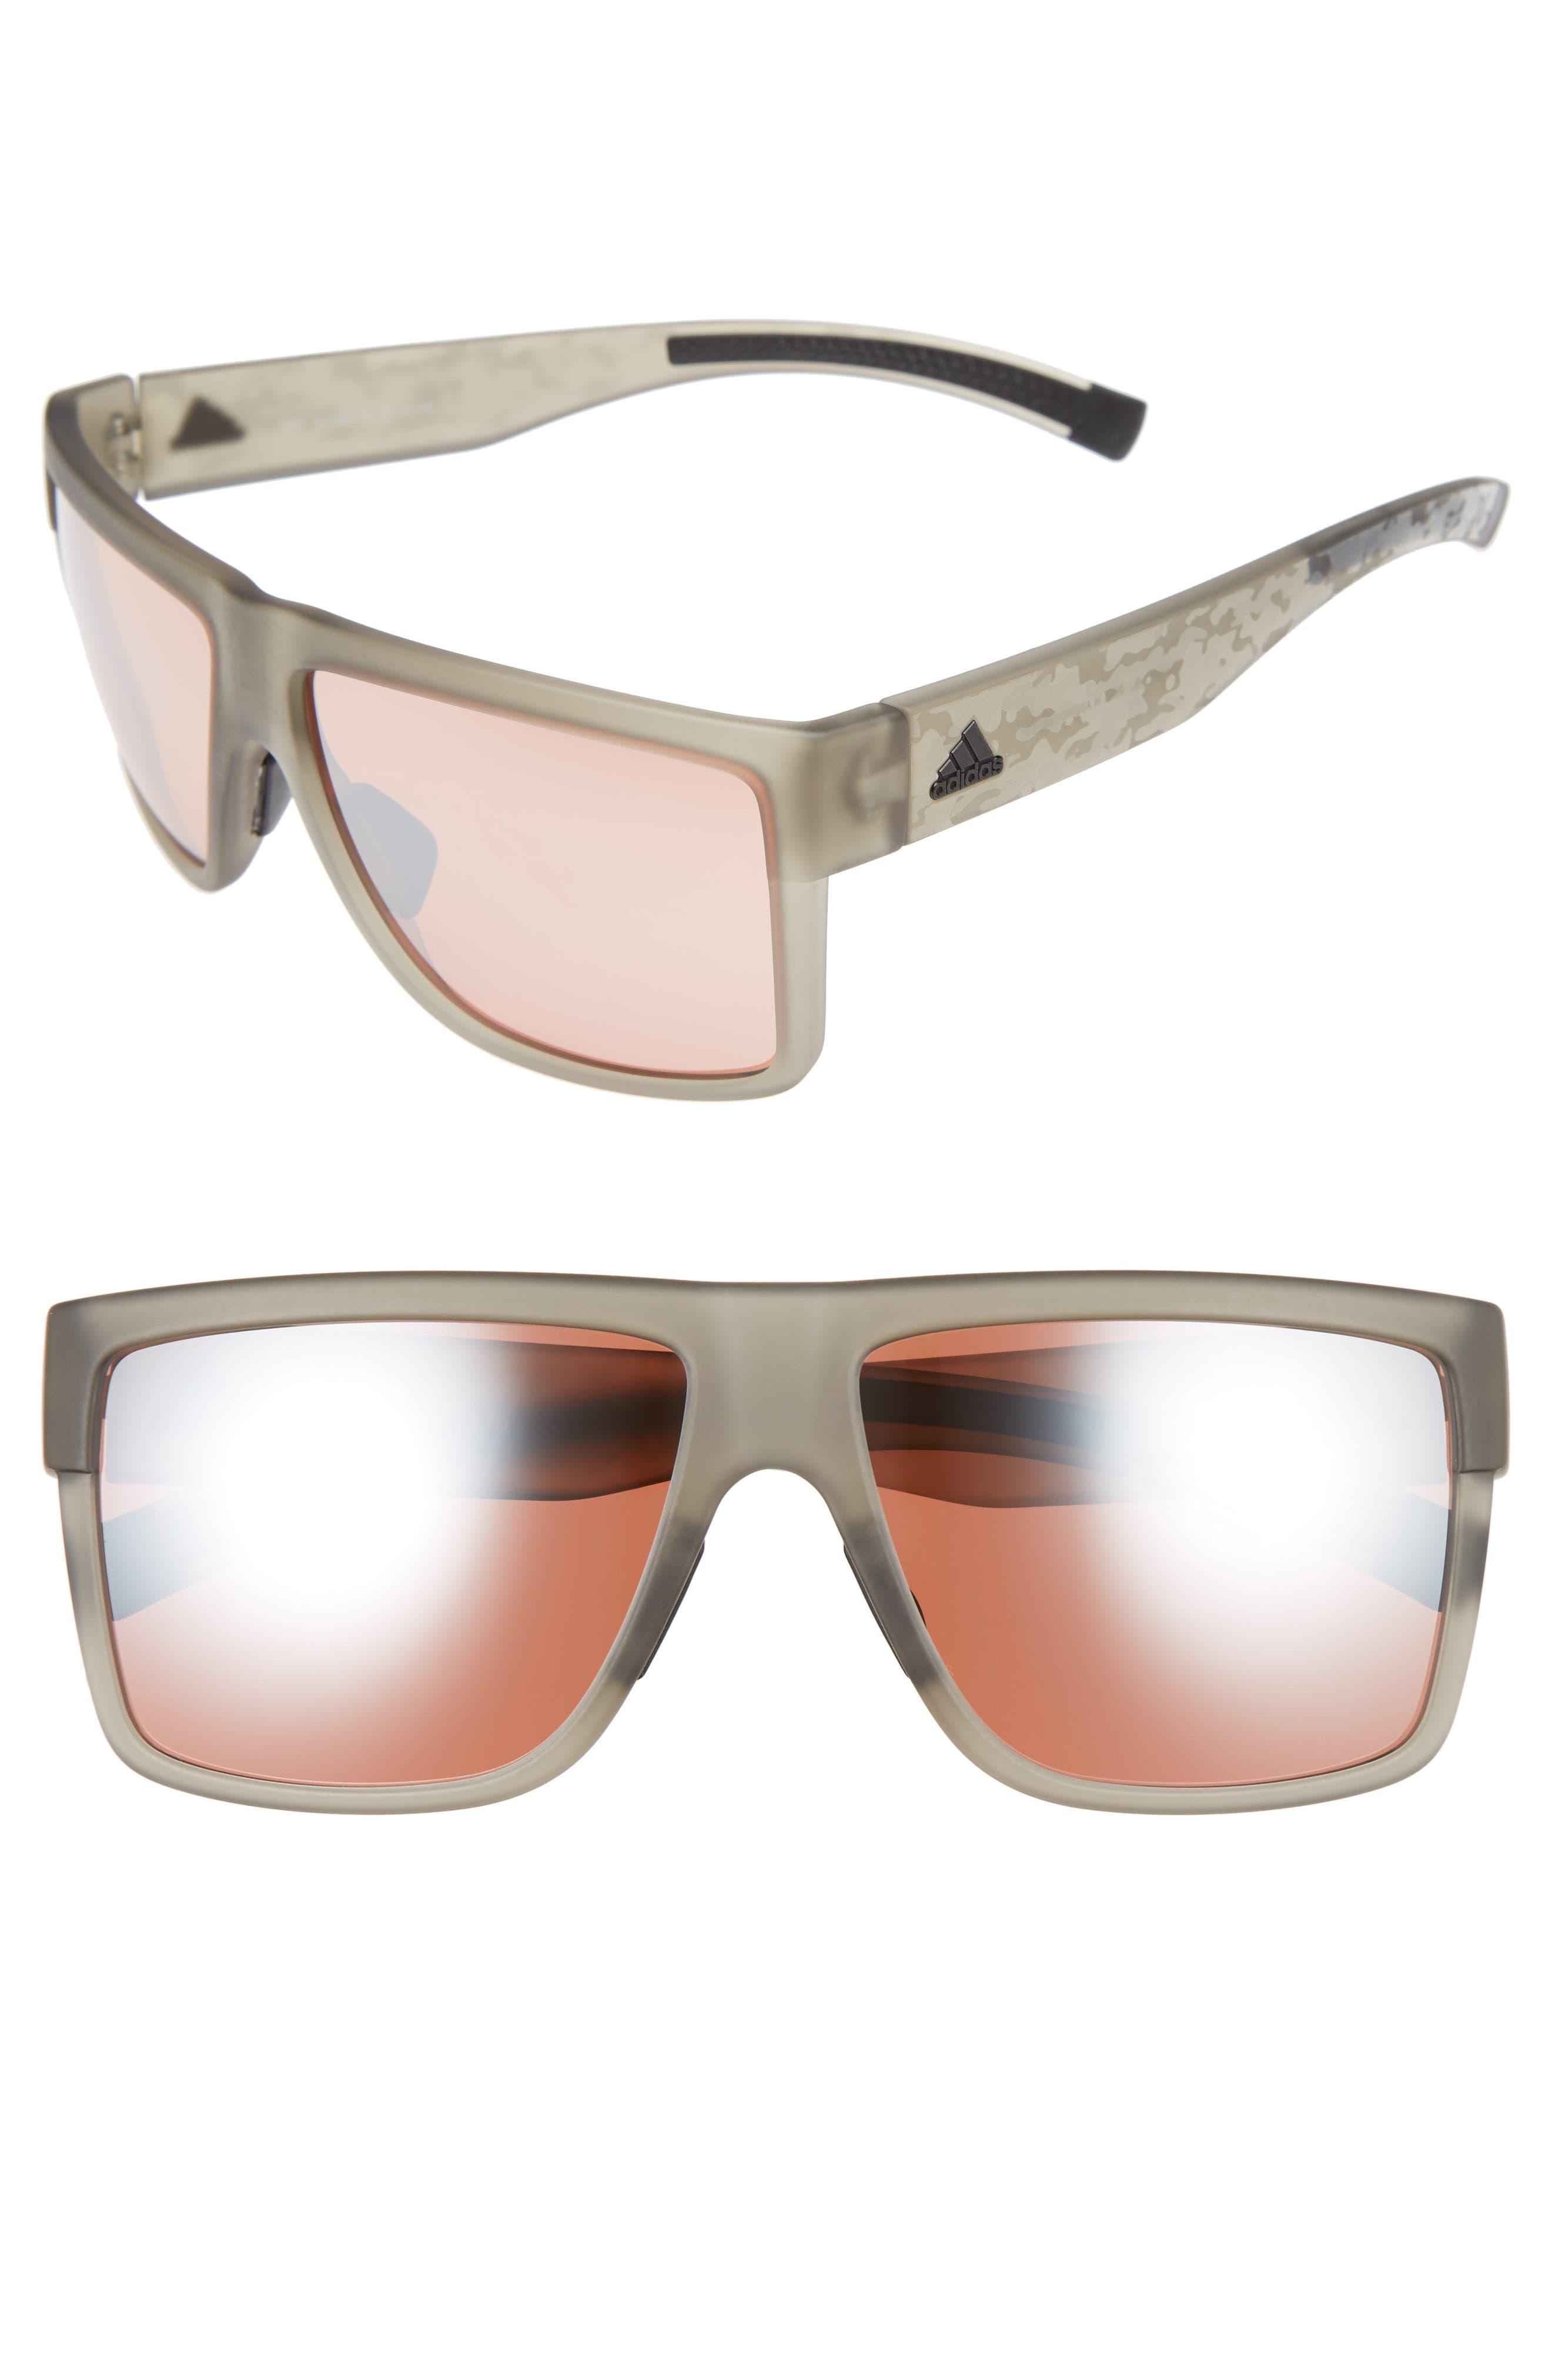 3Matic 60mm Sunglasses,                             Main thumbnail 1, color,                             202